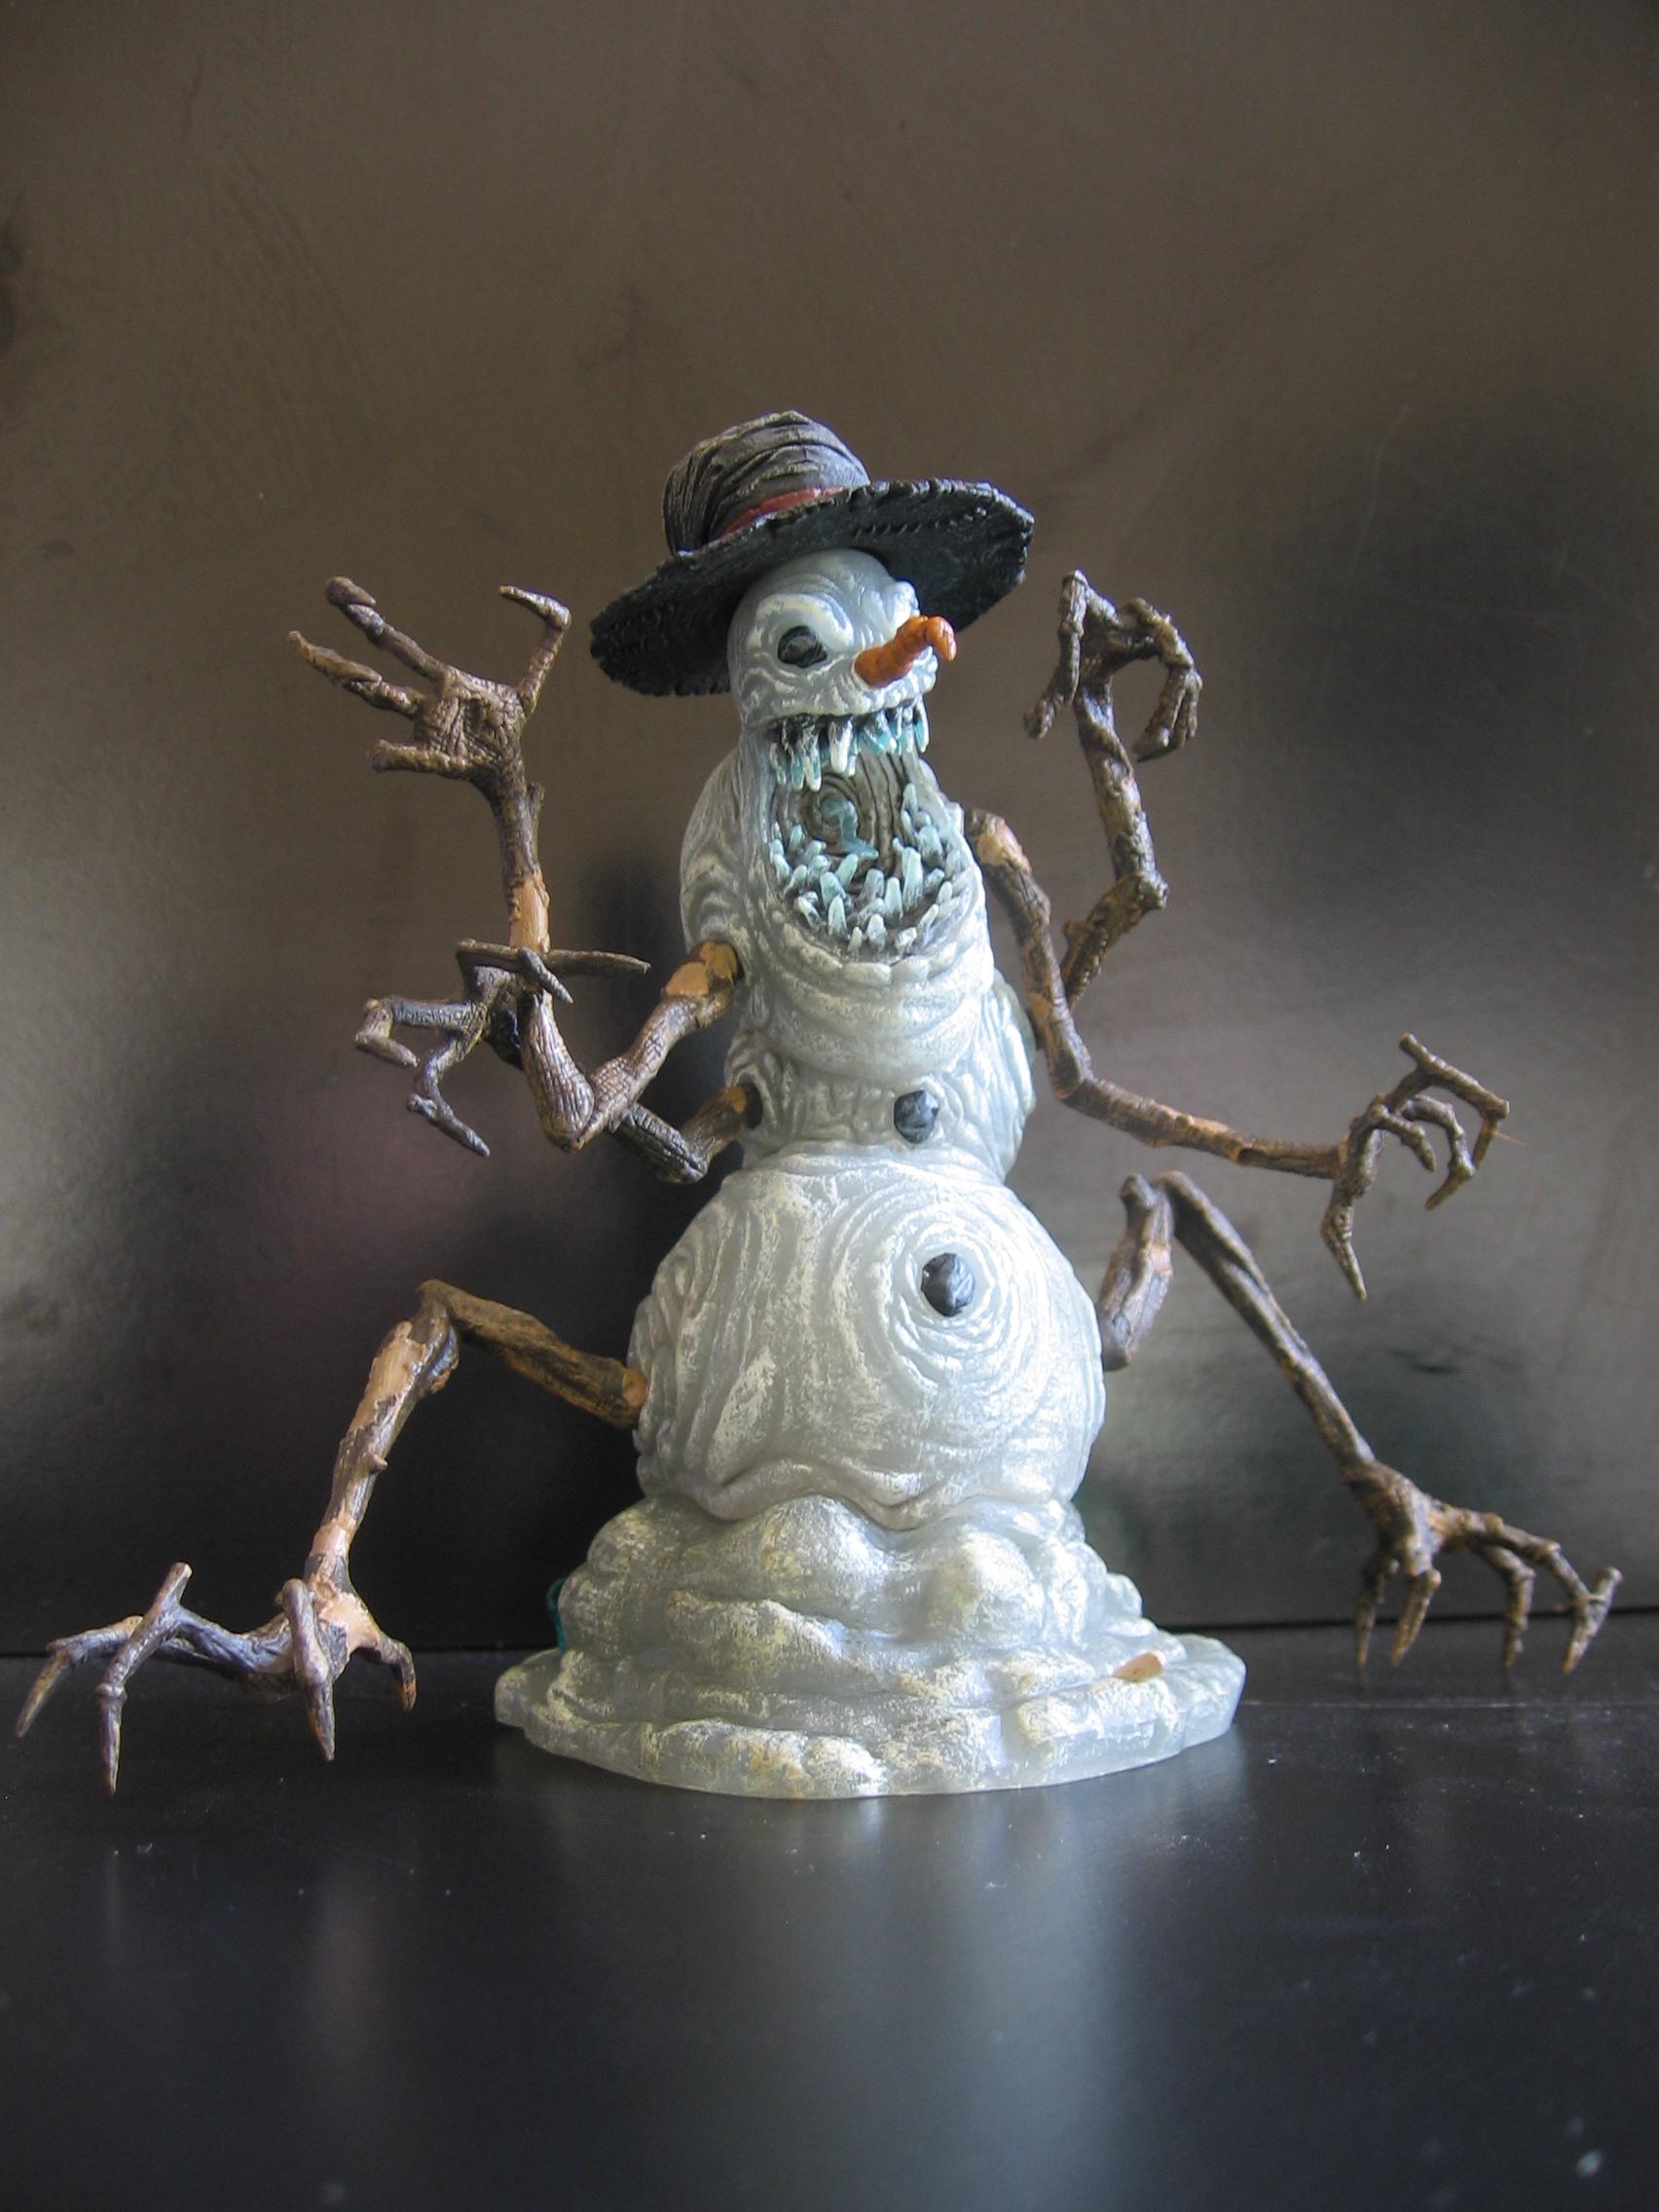 Snowman 01 by restmlinstock